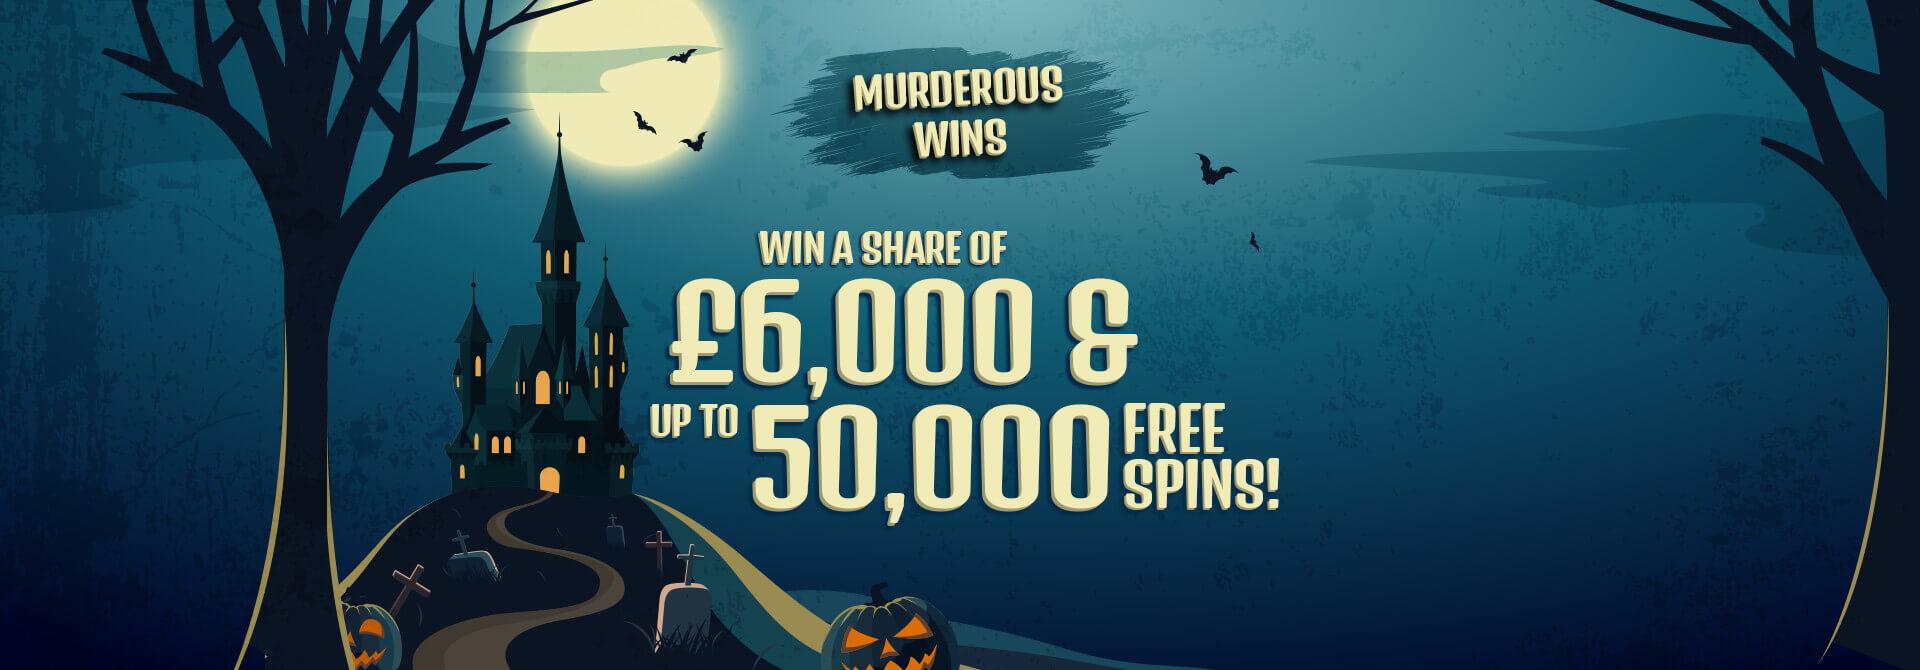 Our Murderous Wins Halloween Prize-Winners!